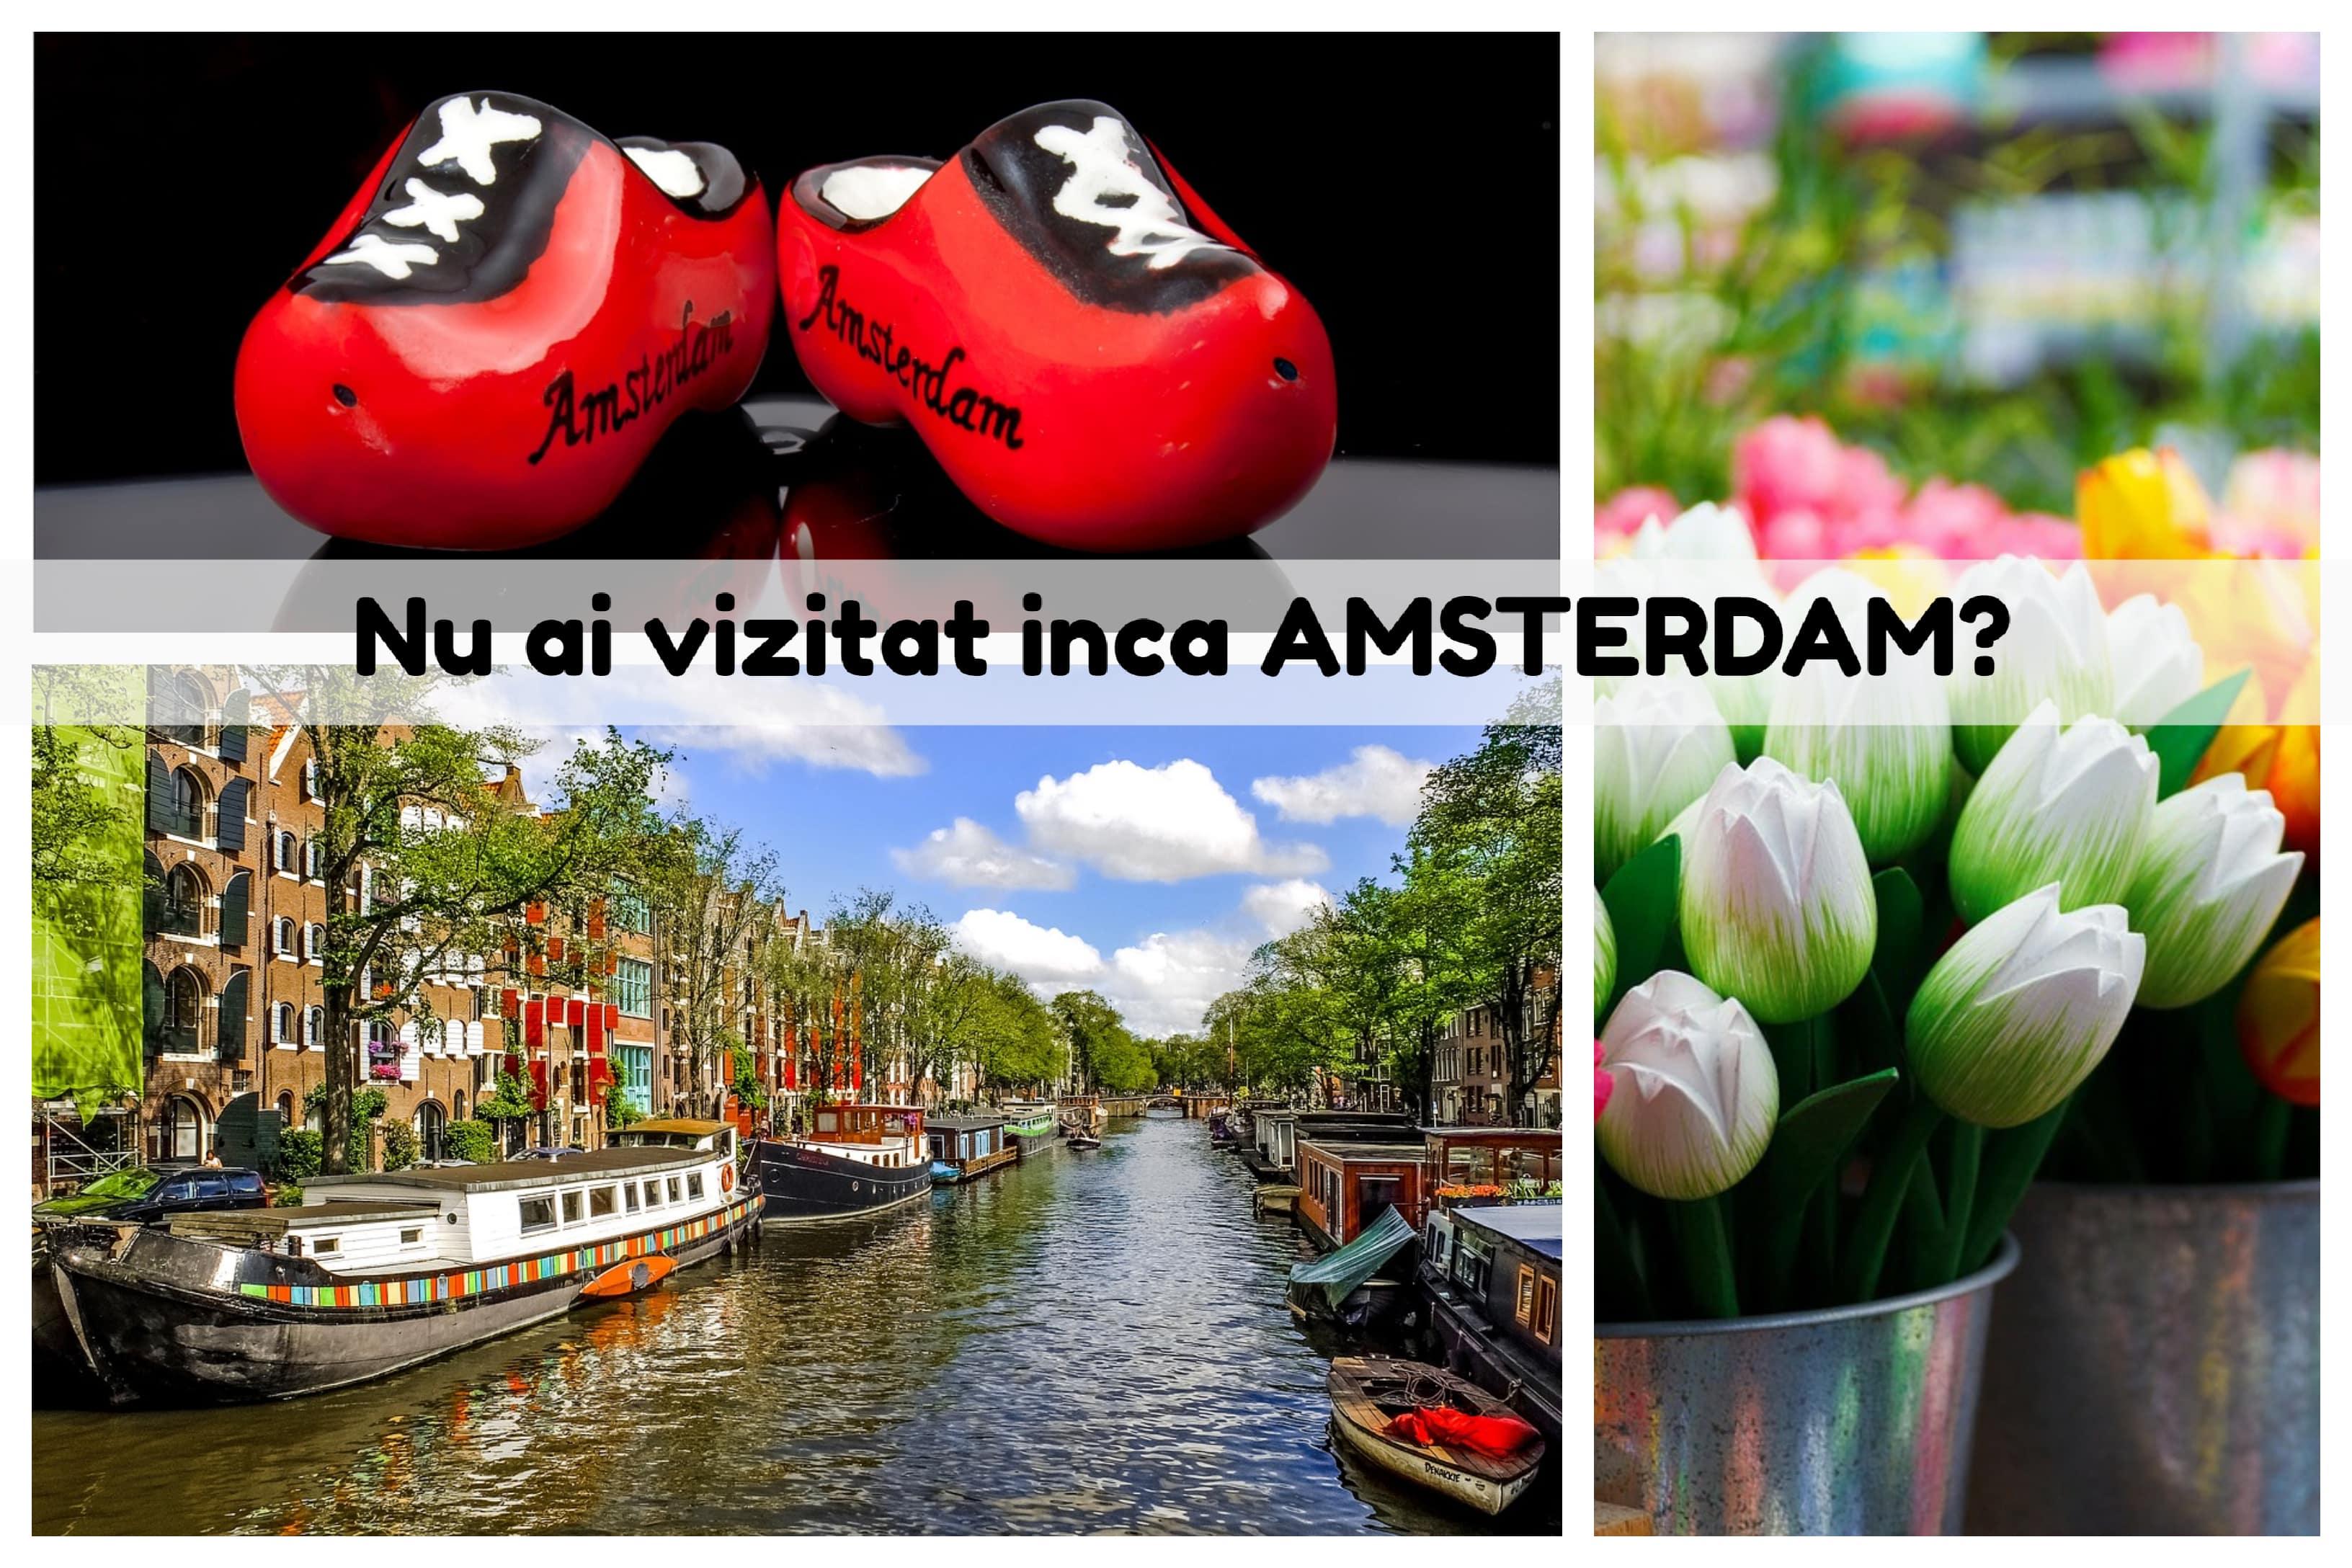 Oferta KLM Amsterdam - imagini din Amsterdam intr-un city break cu KLM